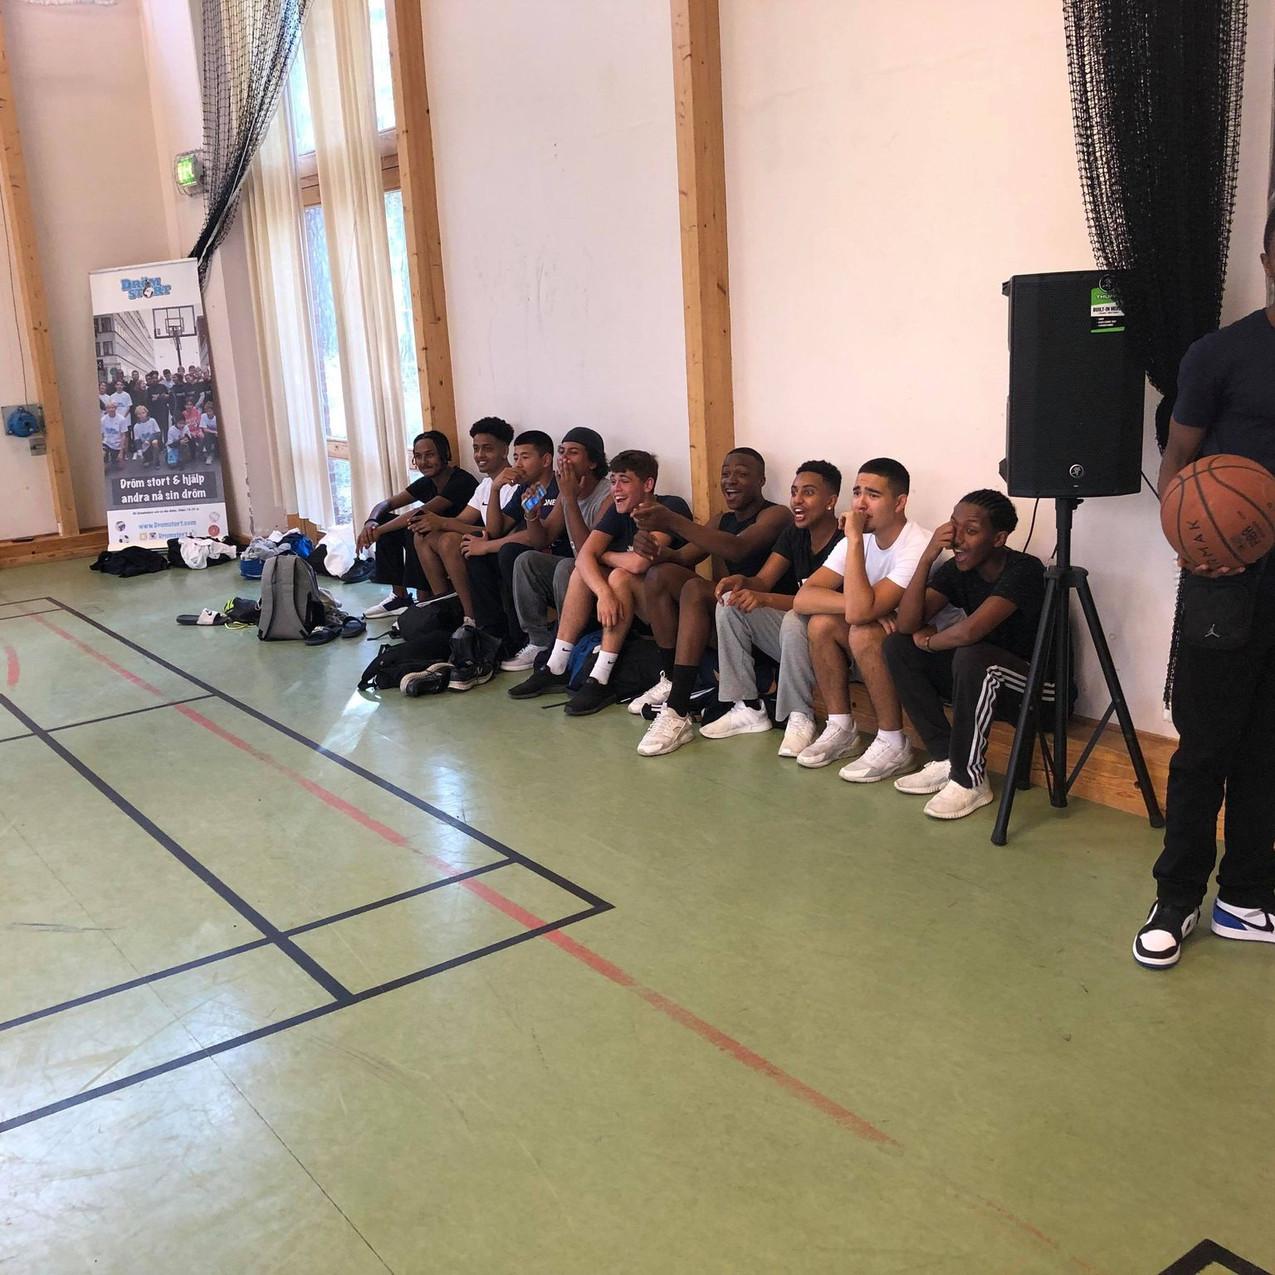 Basket husby